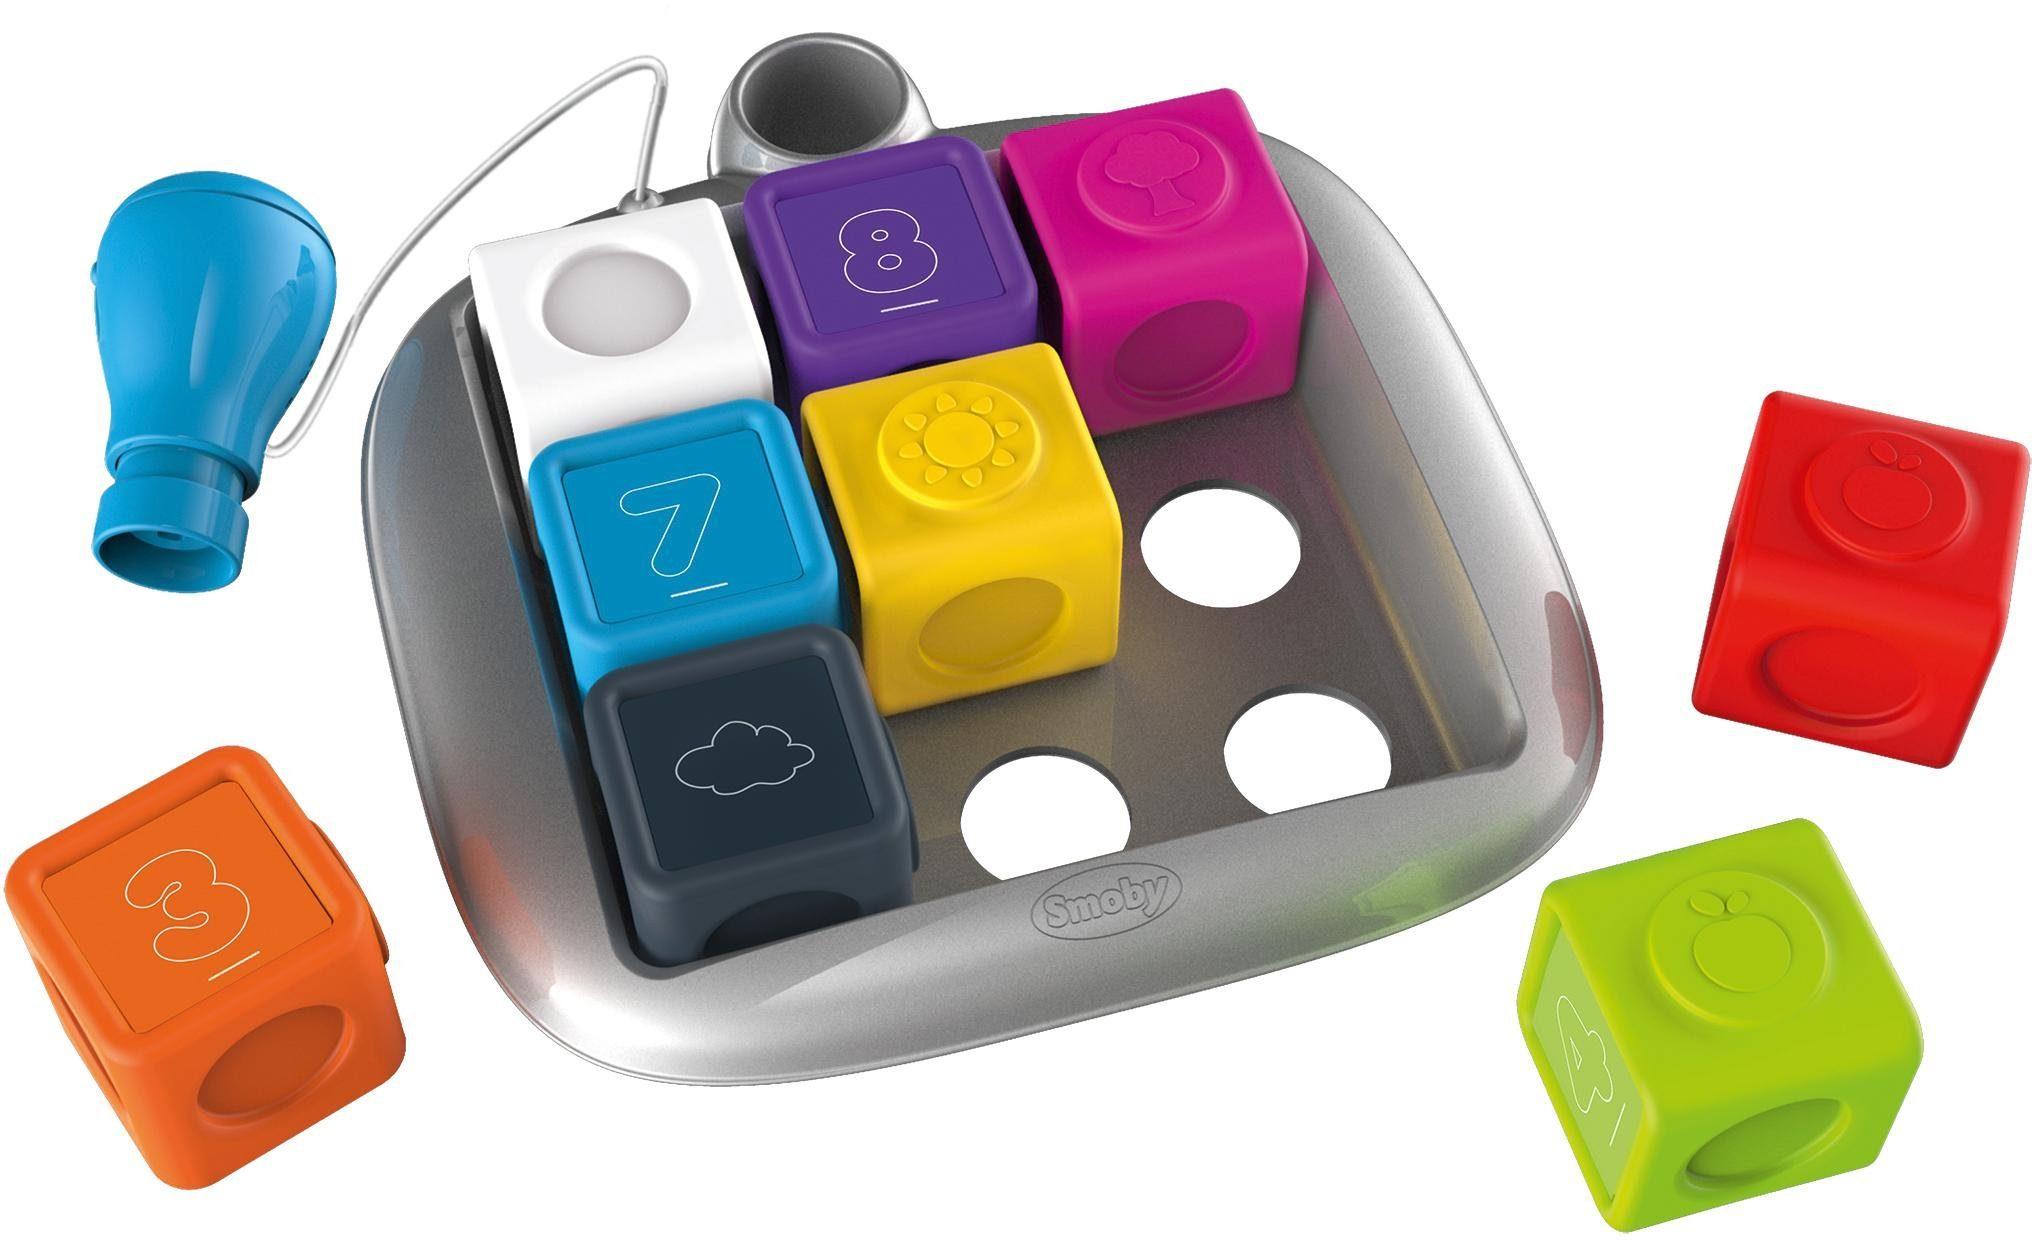 "Smoby Spiel ""Smoby Smart - Würfel"" Technik & Freizeit/Spielzeug/Lernspielzeug/Lernspiele"